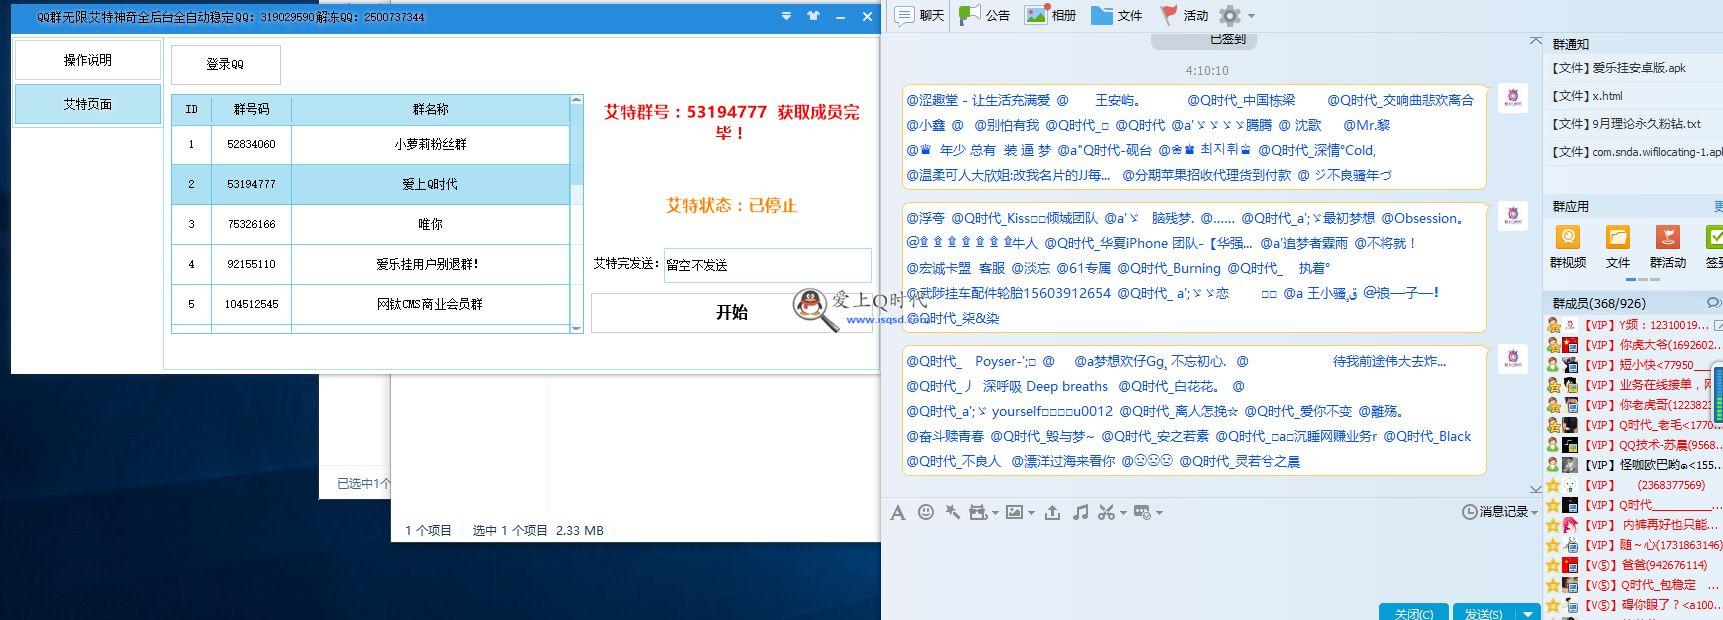 QQ群专用反诅咒图片_手机永恒网